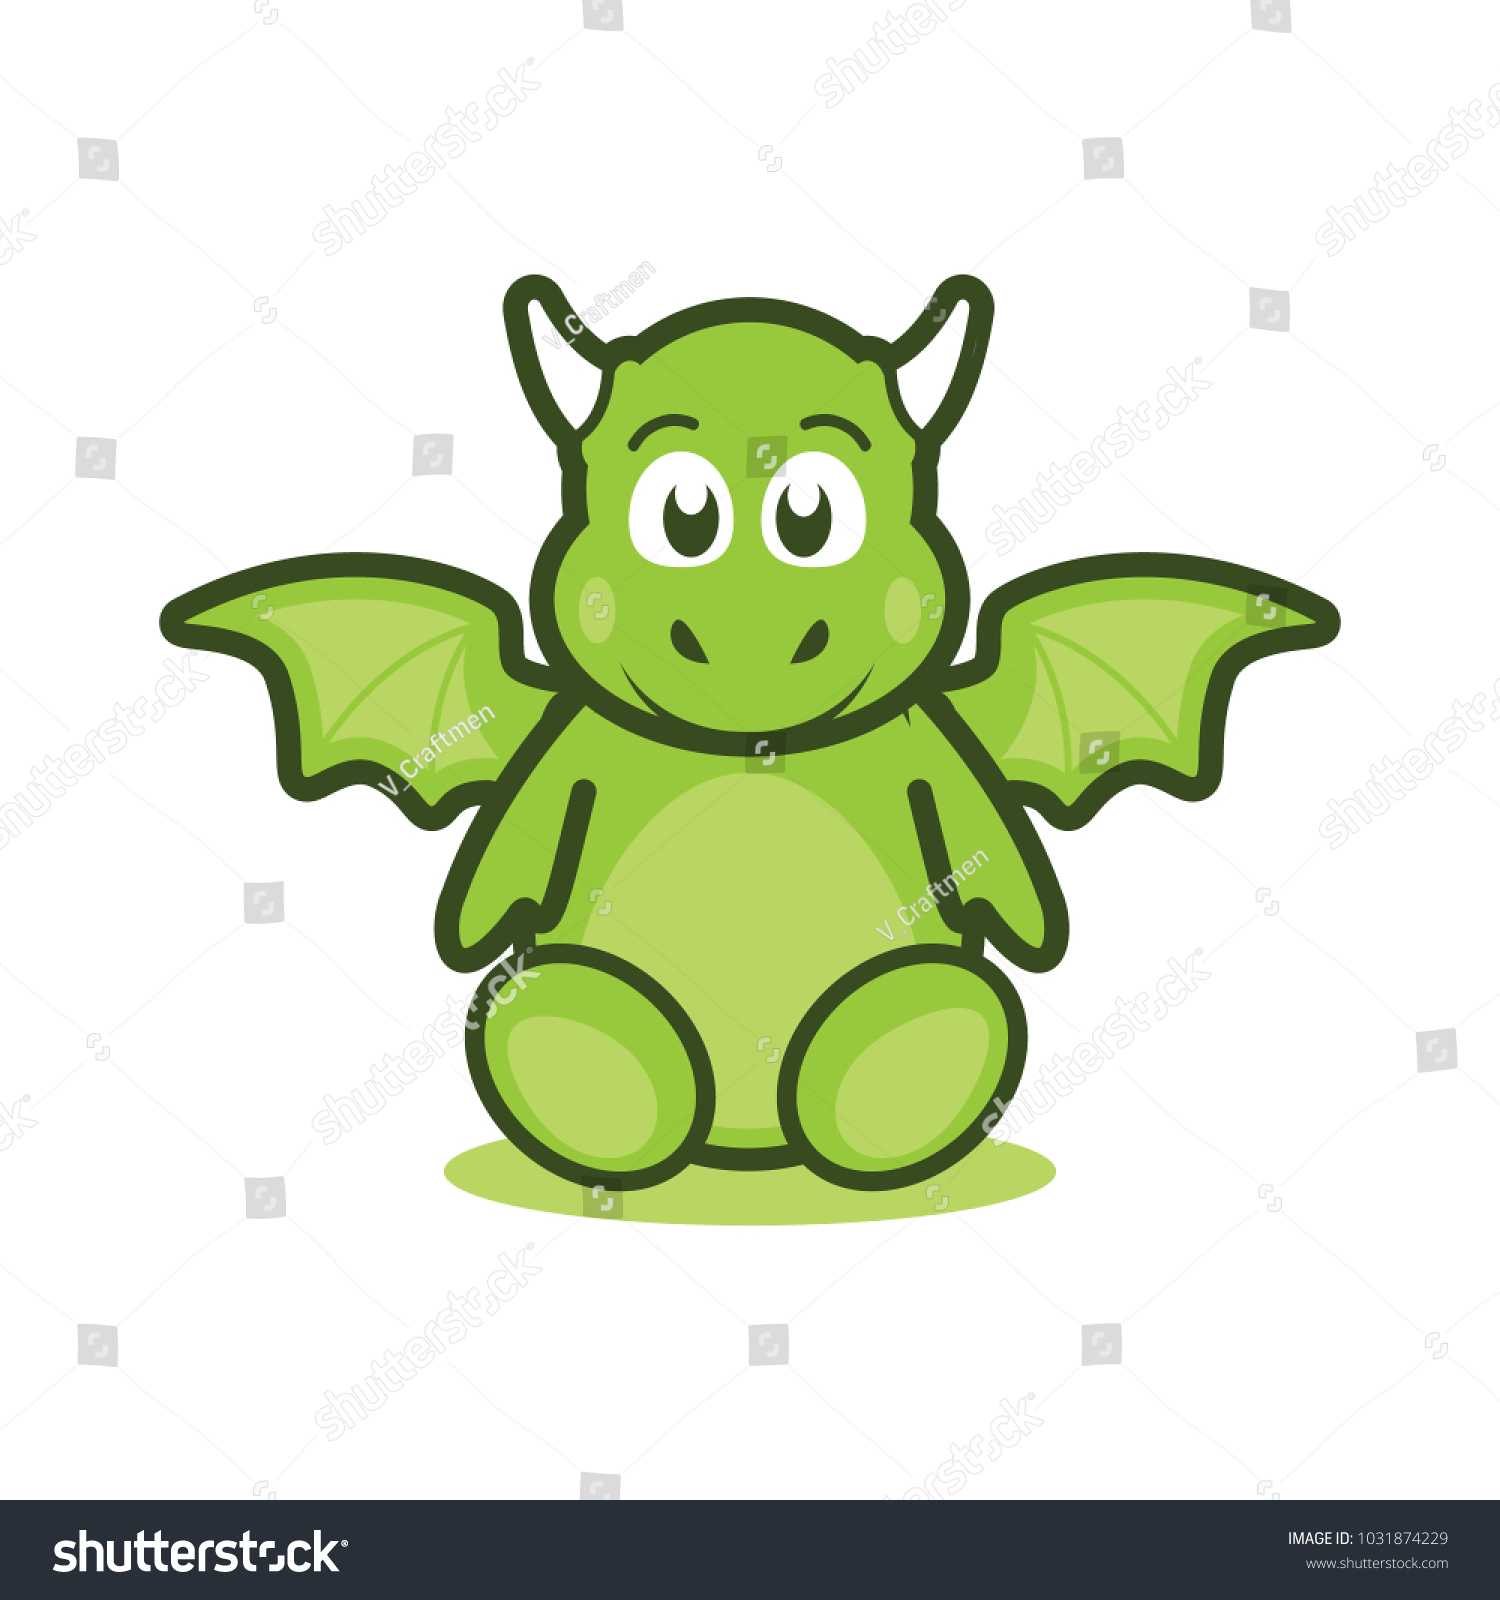 Cute Baby Dragon Mascot Logo Illustration Stock Vector Royalty Free 1031874229